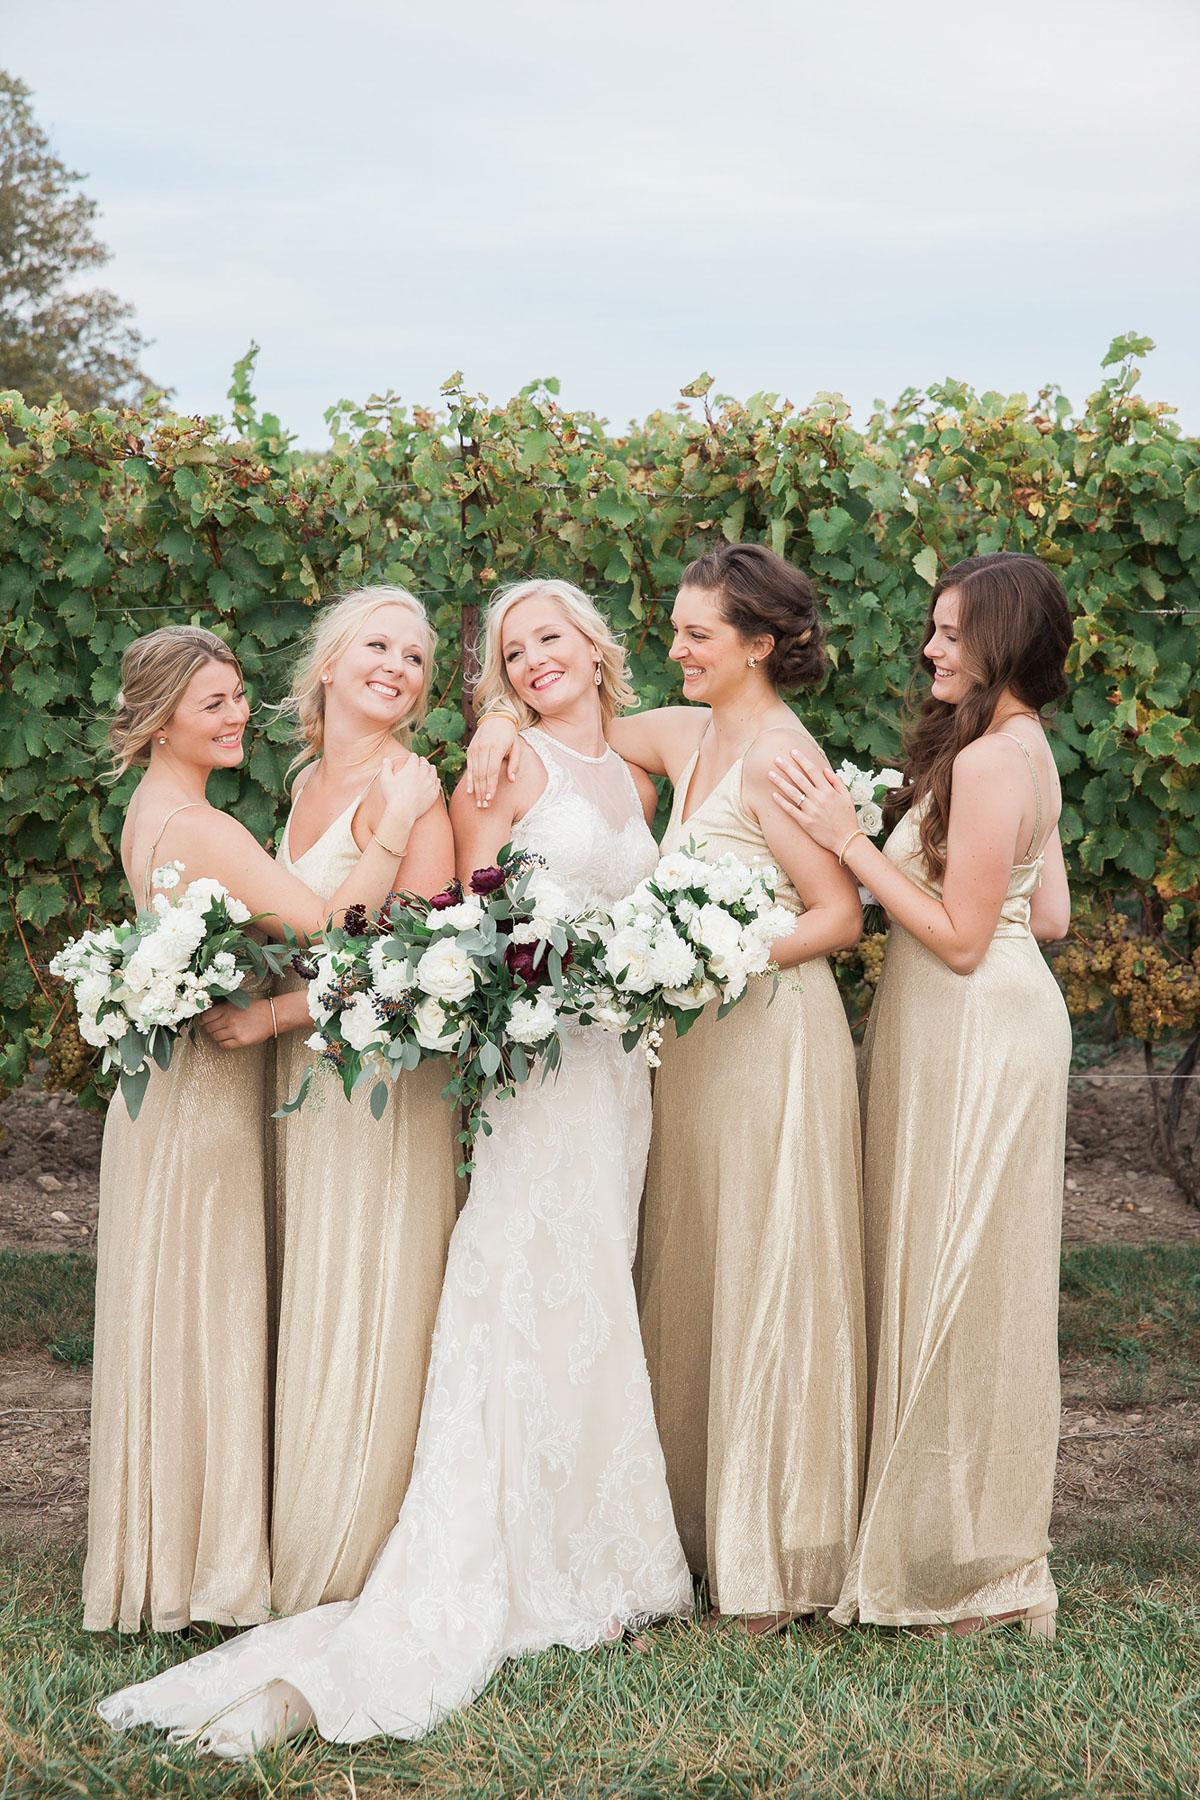 gemini-photography-vineyard-bride-swish-list-honsberger-estates-jordan-wedding-34.jpg